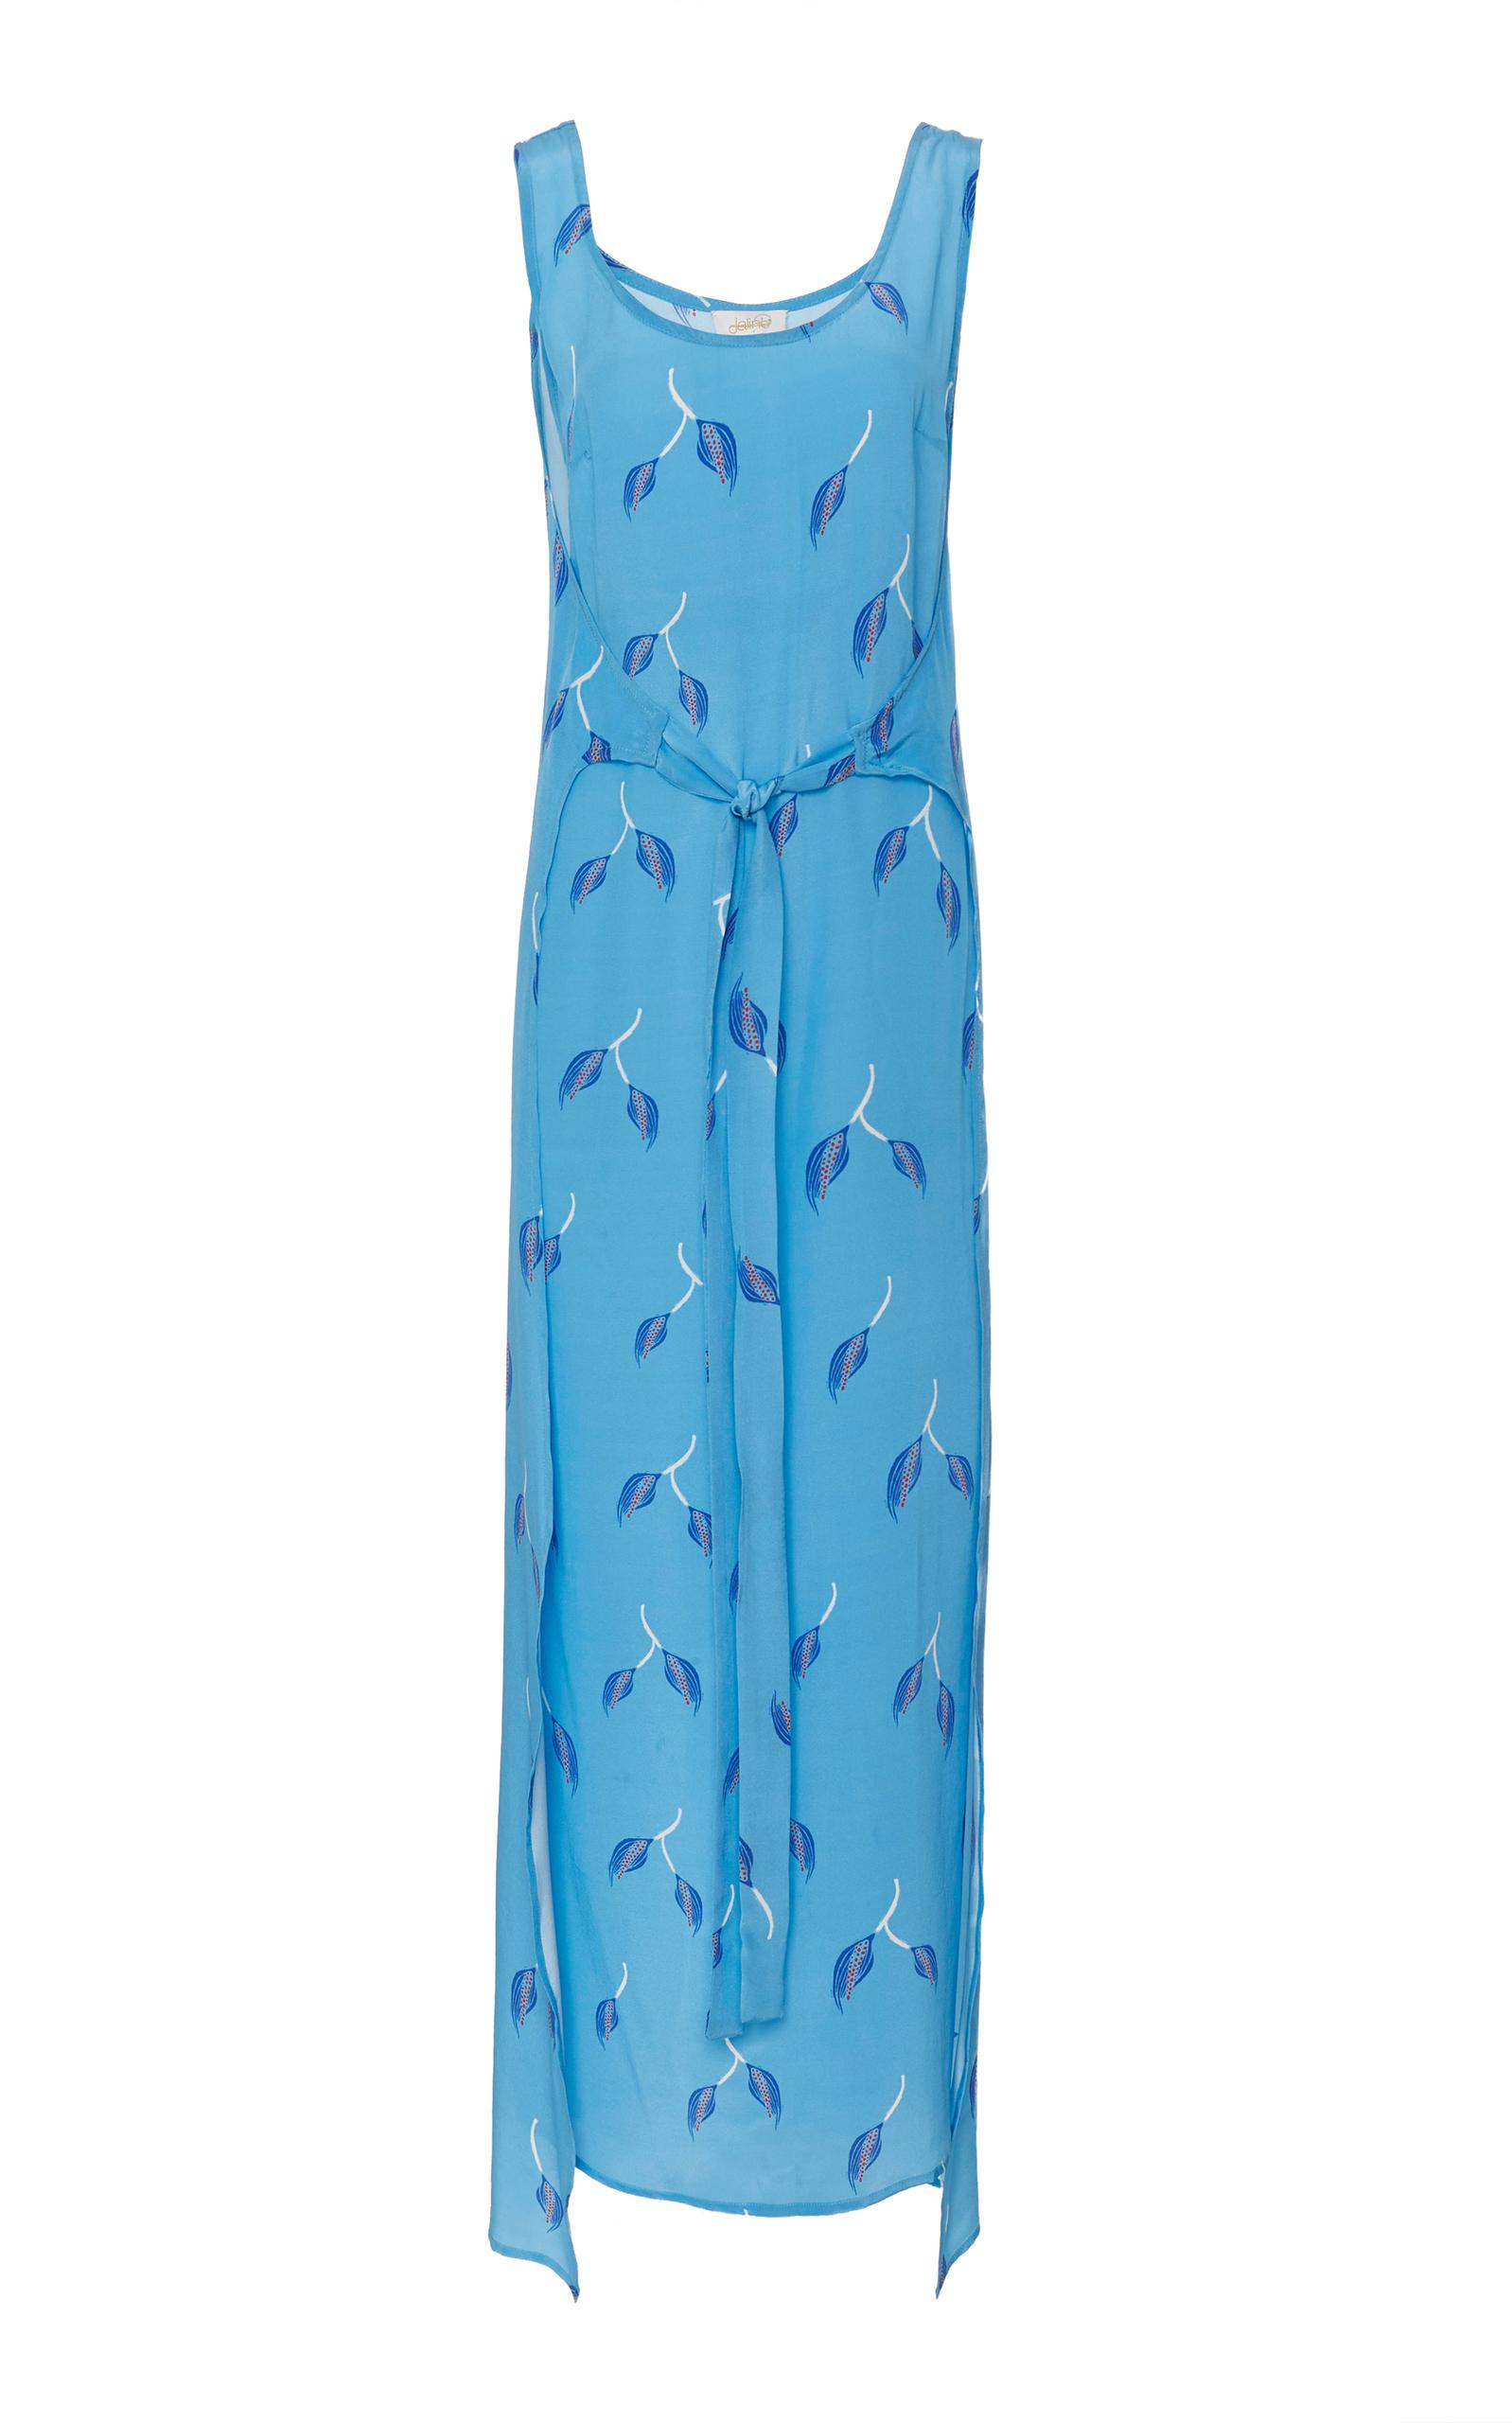 JALINE Elizabeth Dress in Blue